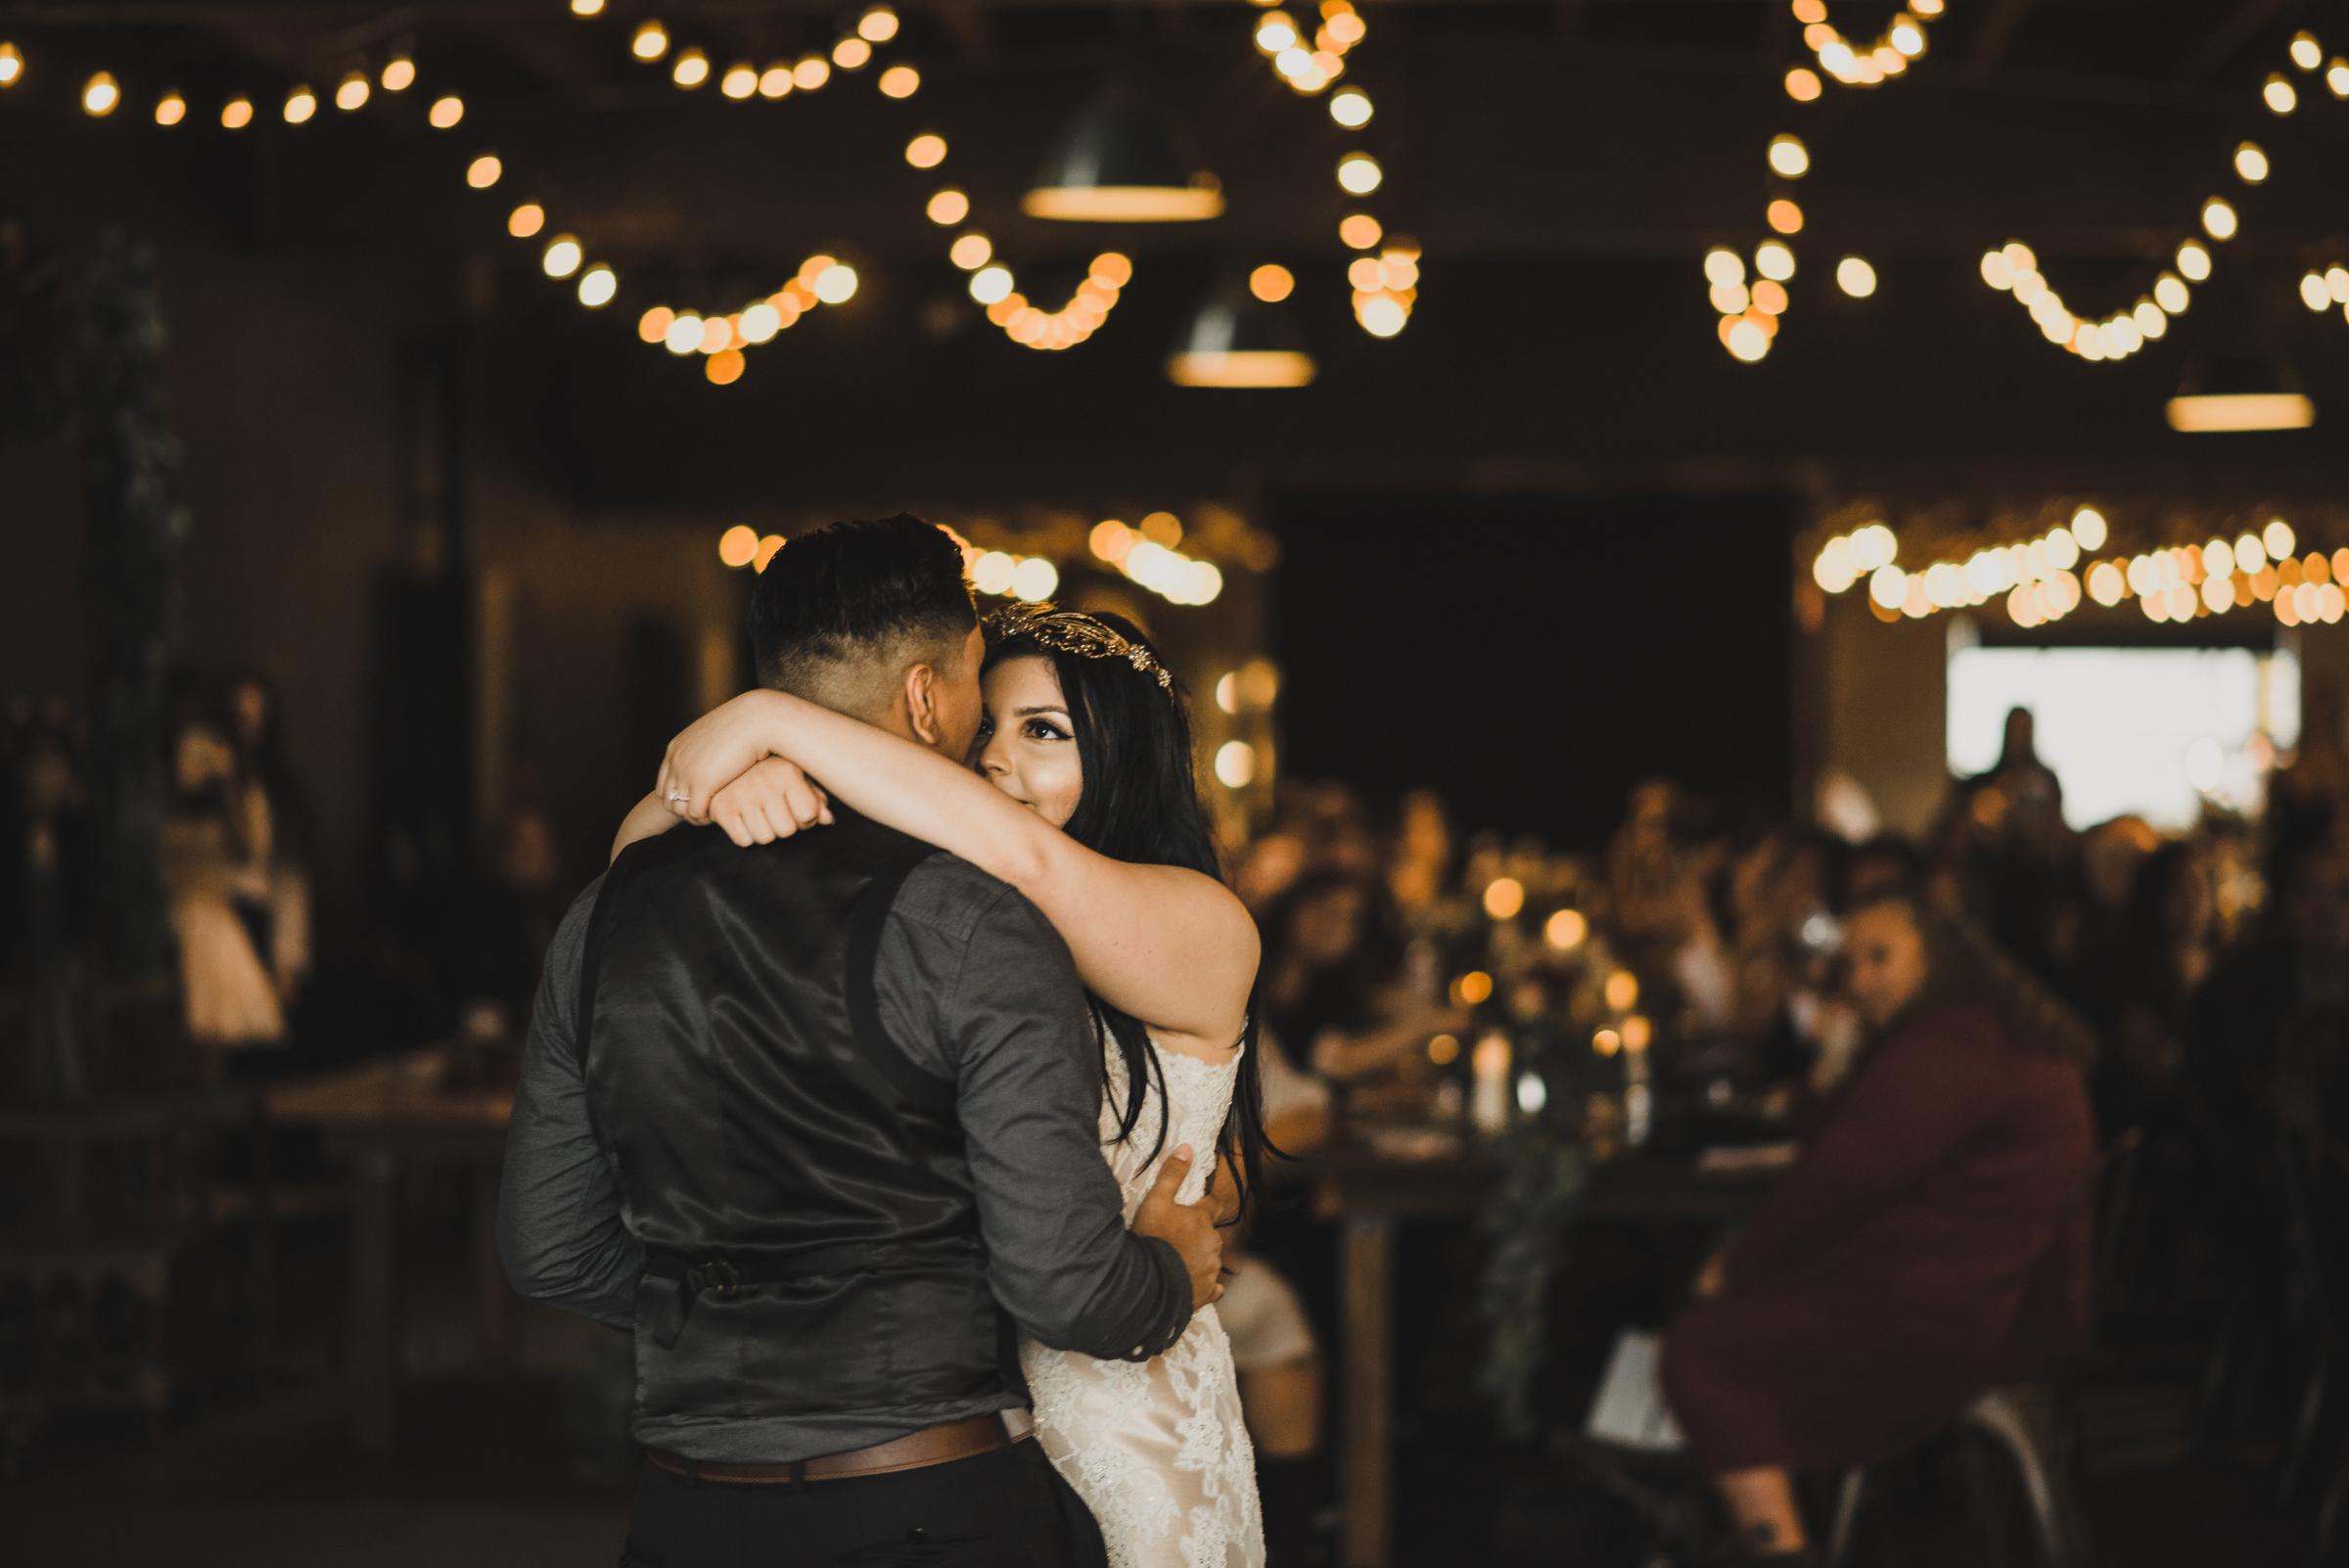 ©Isaiah + Taylor Photography - Smoky Hollow Studios Wedding, El Segundo, Los Angeles Wedding Photographer-118.jpg